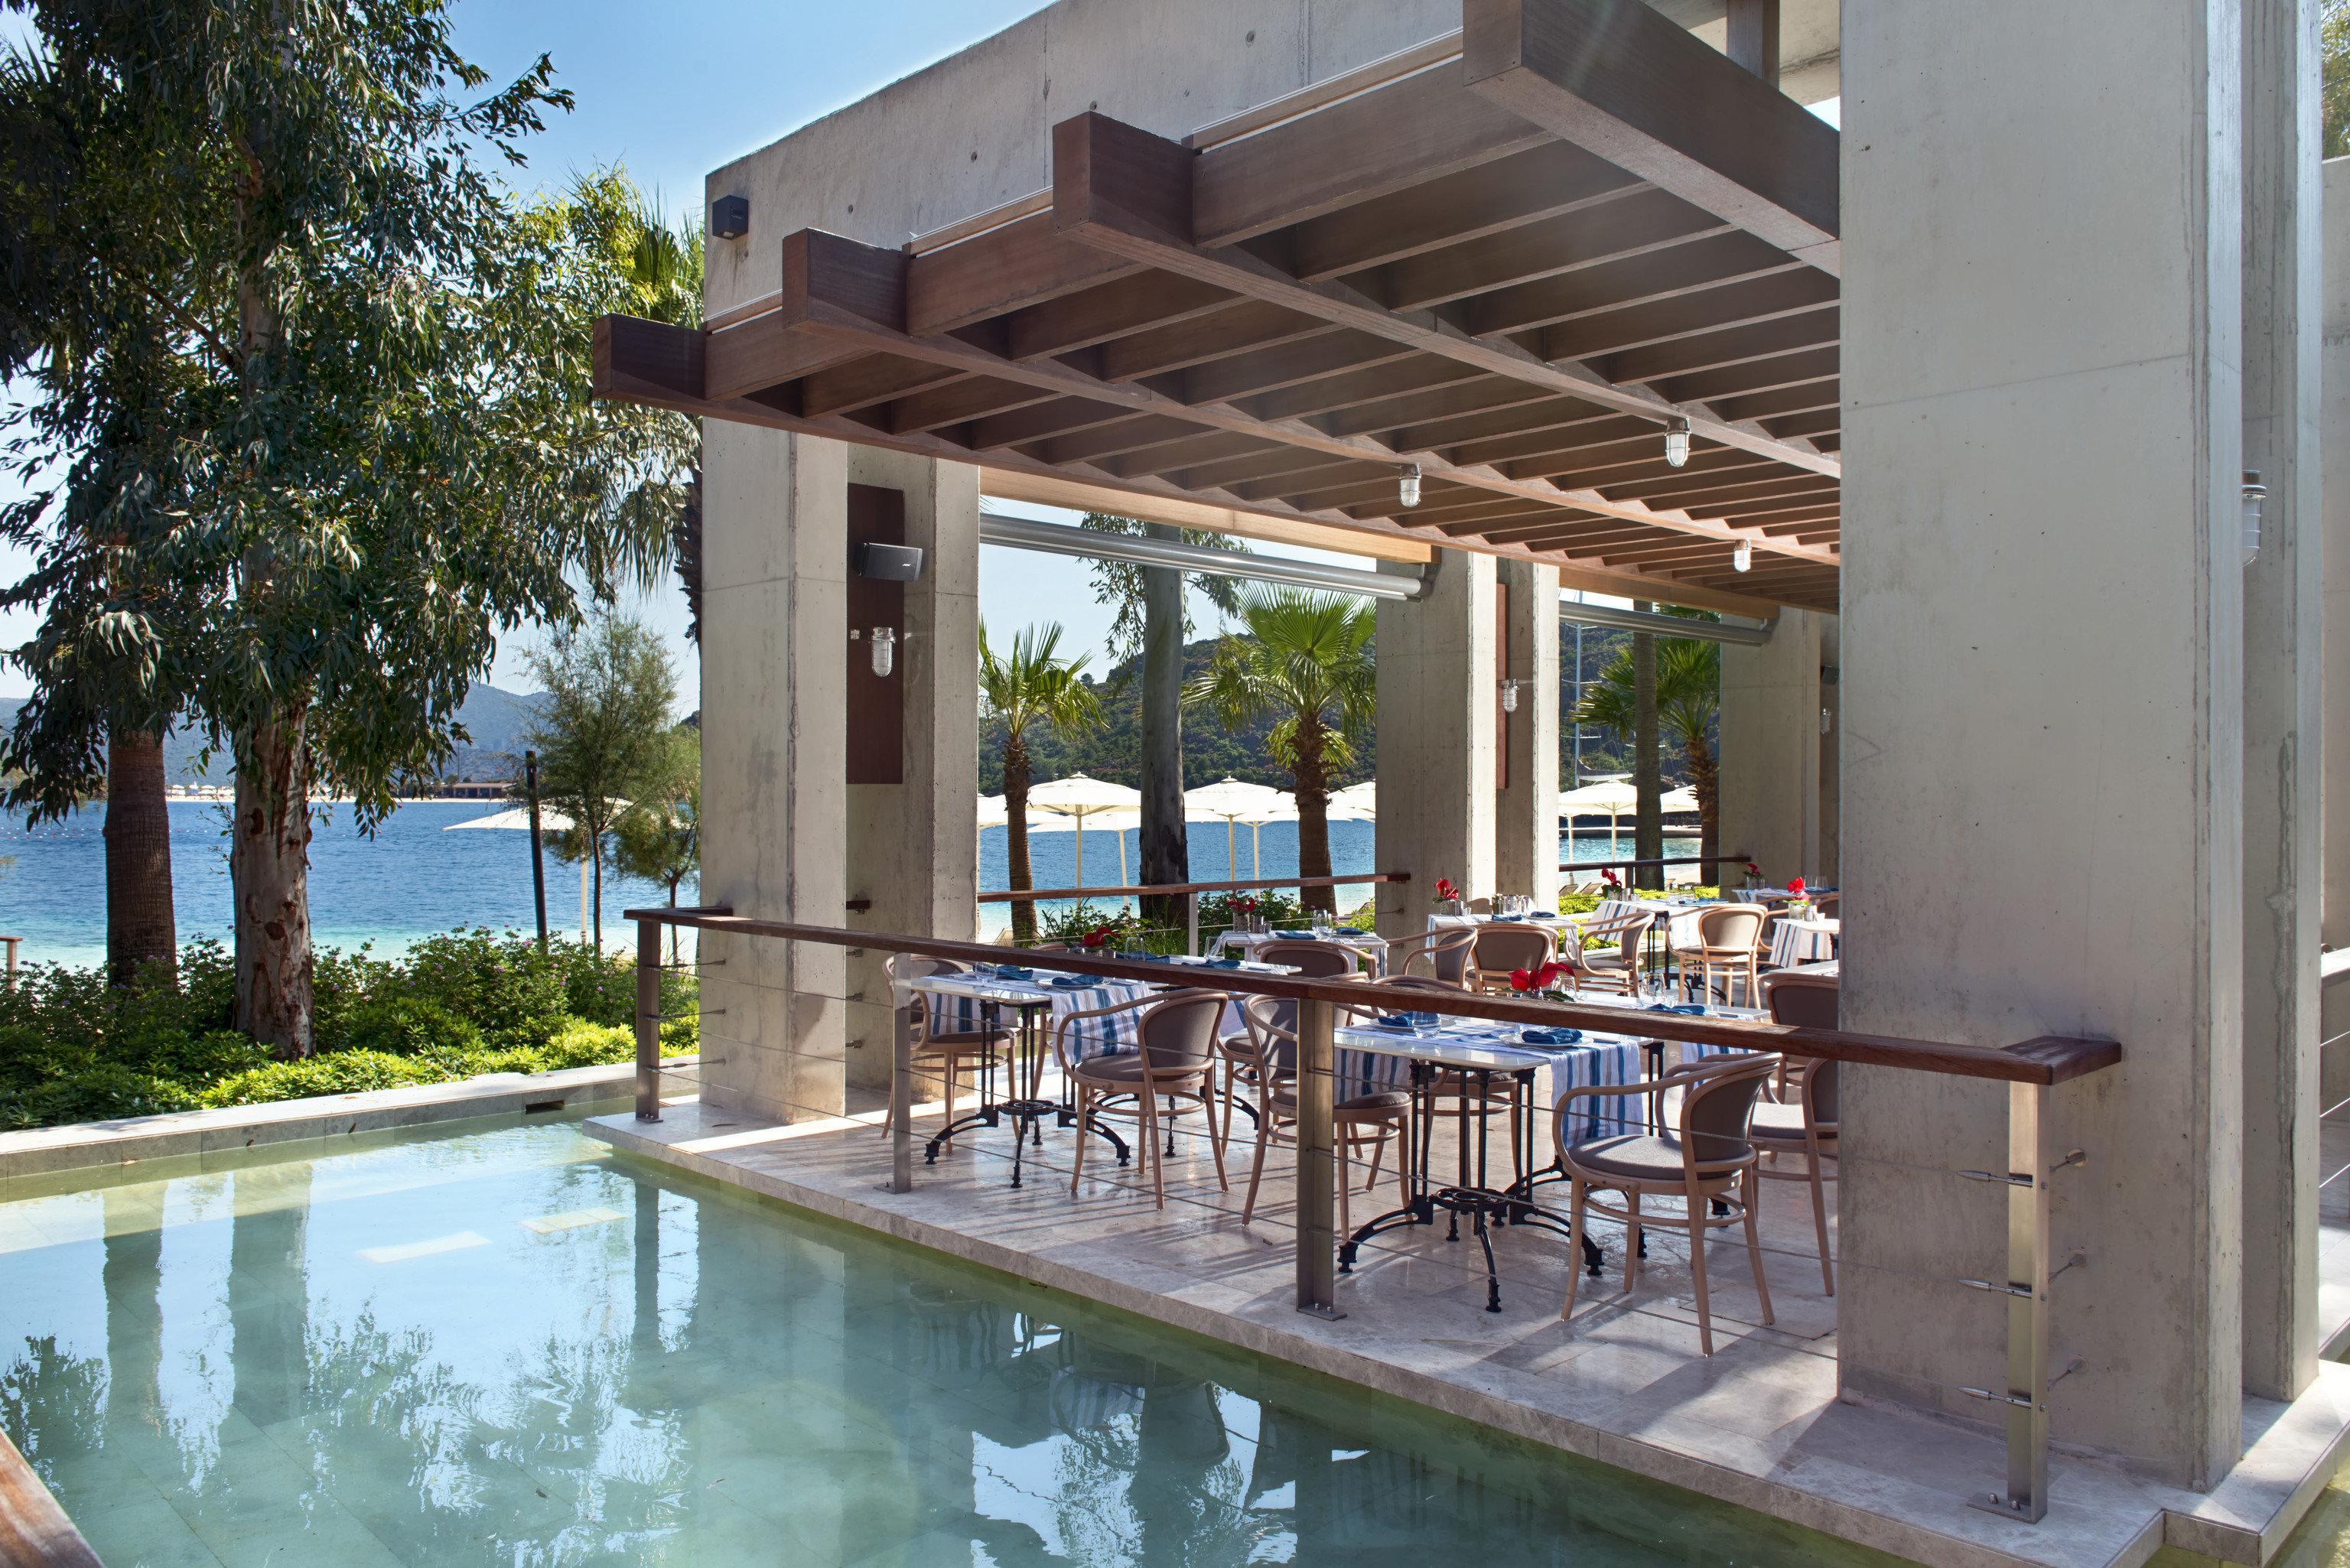 tree building property Villa home outdoor structure condominium backyard swimming pool cottage hacienda Courtyard Resort